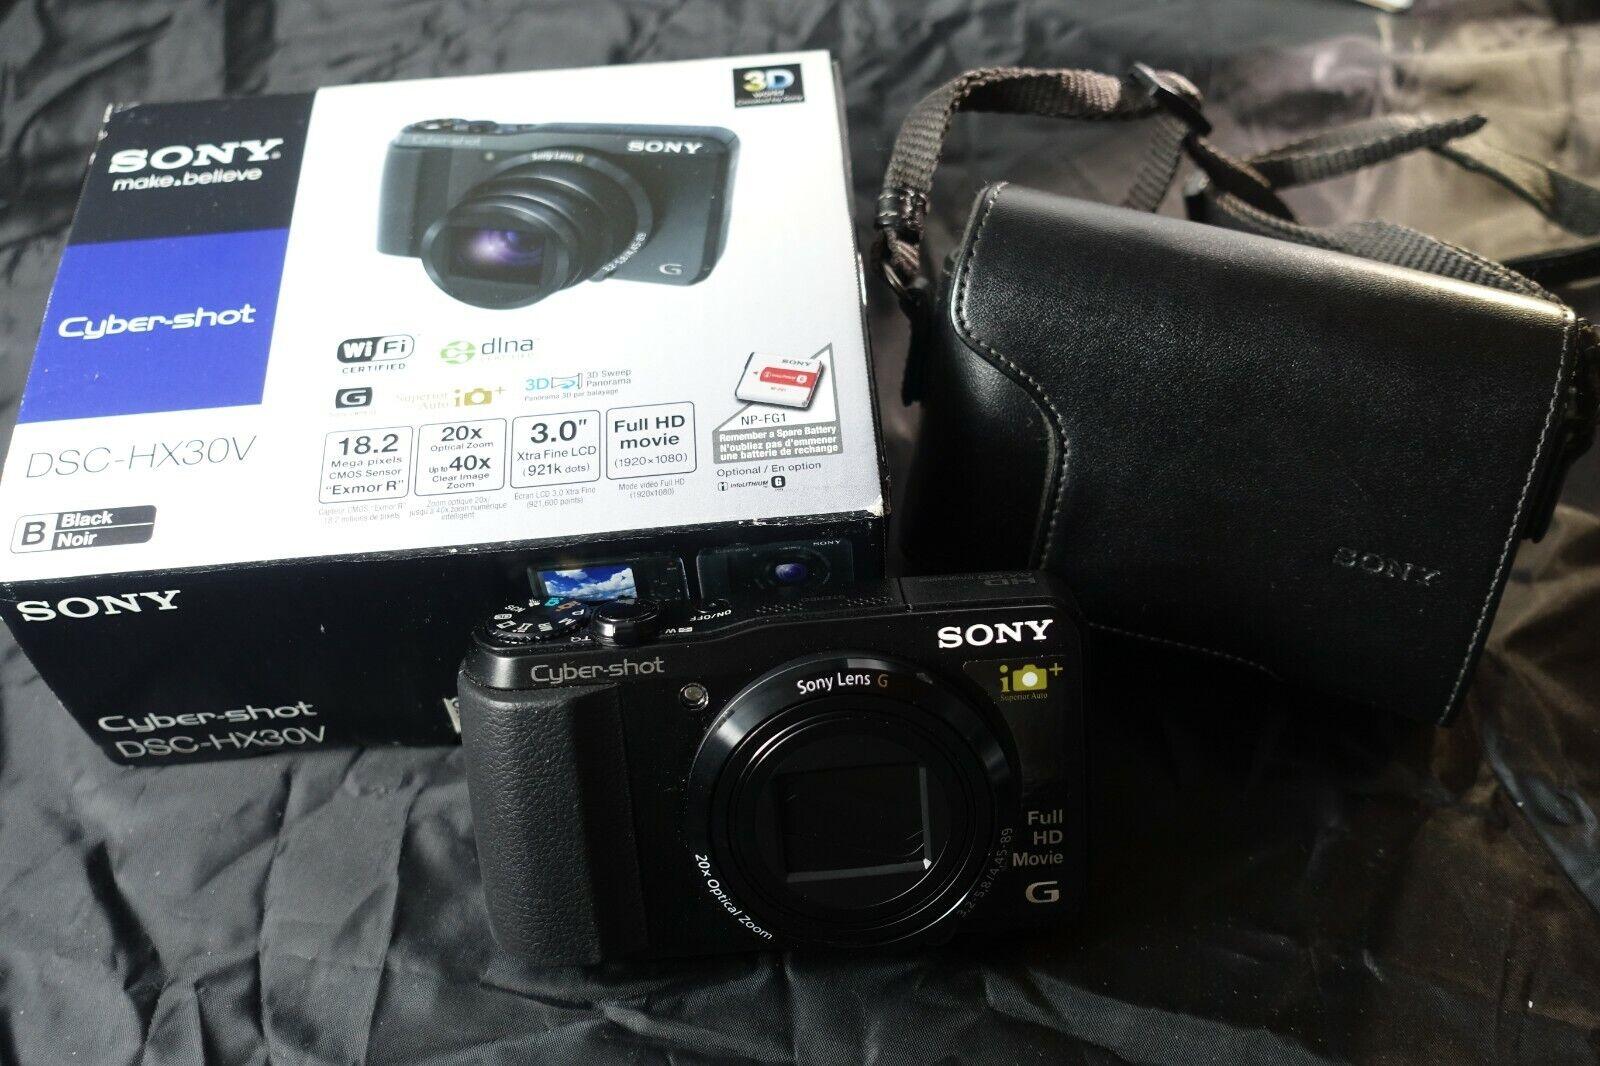 SDHC Sony Cyber-Shot DSC-HX30V Digital Camera Memory Card 2 x 16GB Secure Digital High Capacity Memory Cards 2 Pack